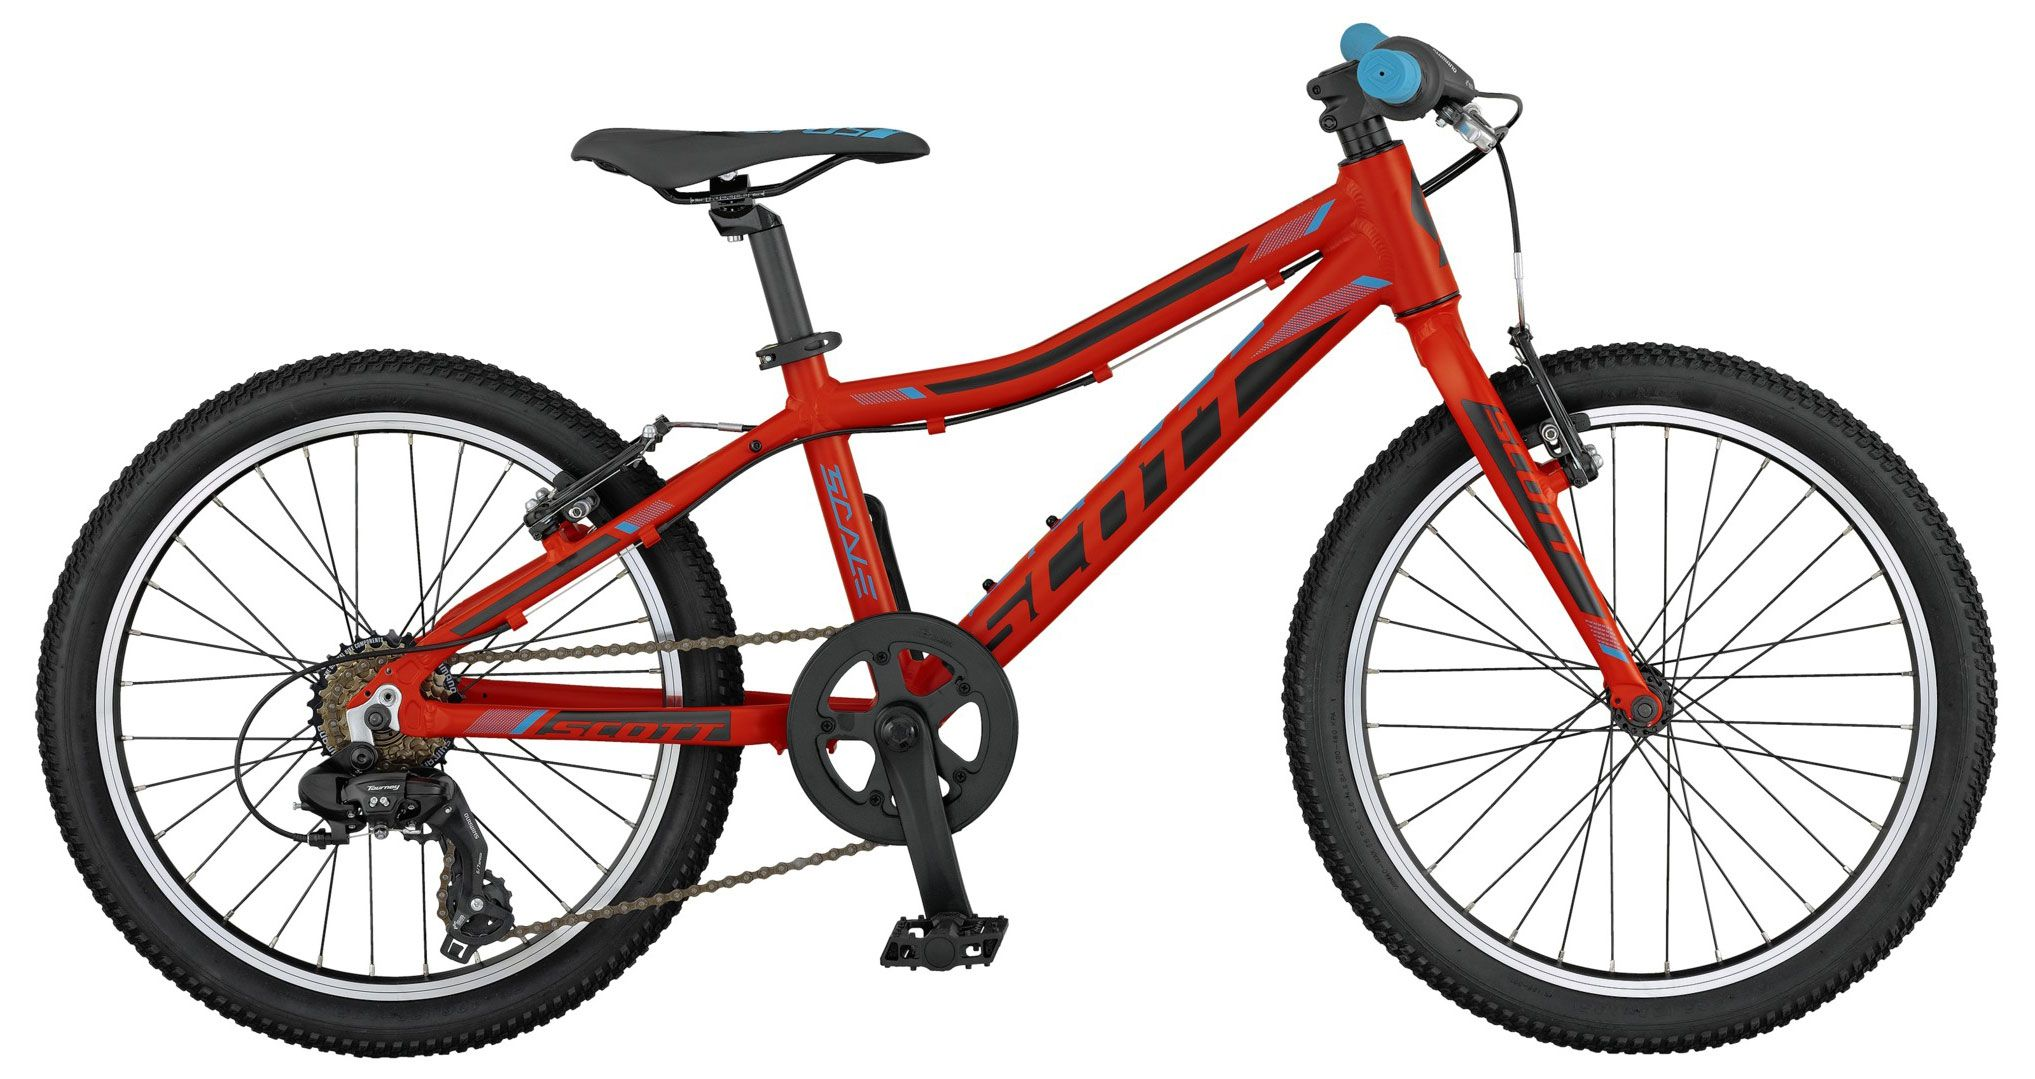 Велосипед Scott Scale JR 20 rigid fork 2017 велосипед scott scale jr 20 20 2016